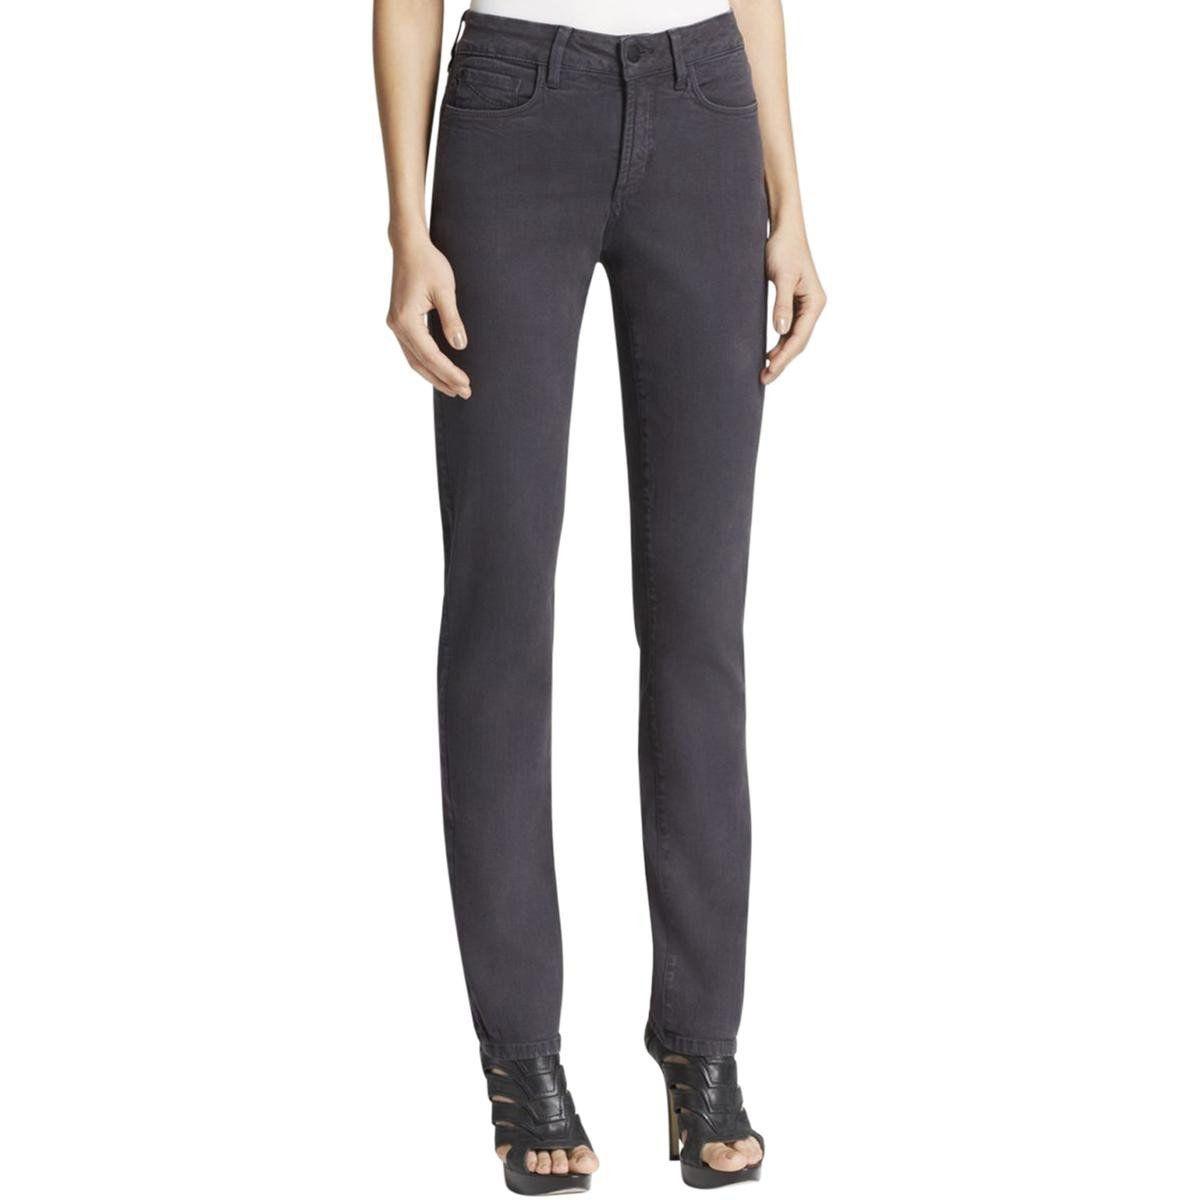 NYDJ Womens Button-Zip Fly Slim Pants